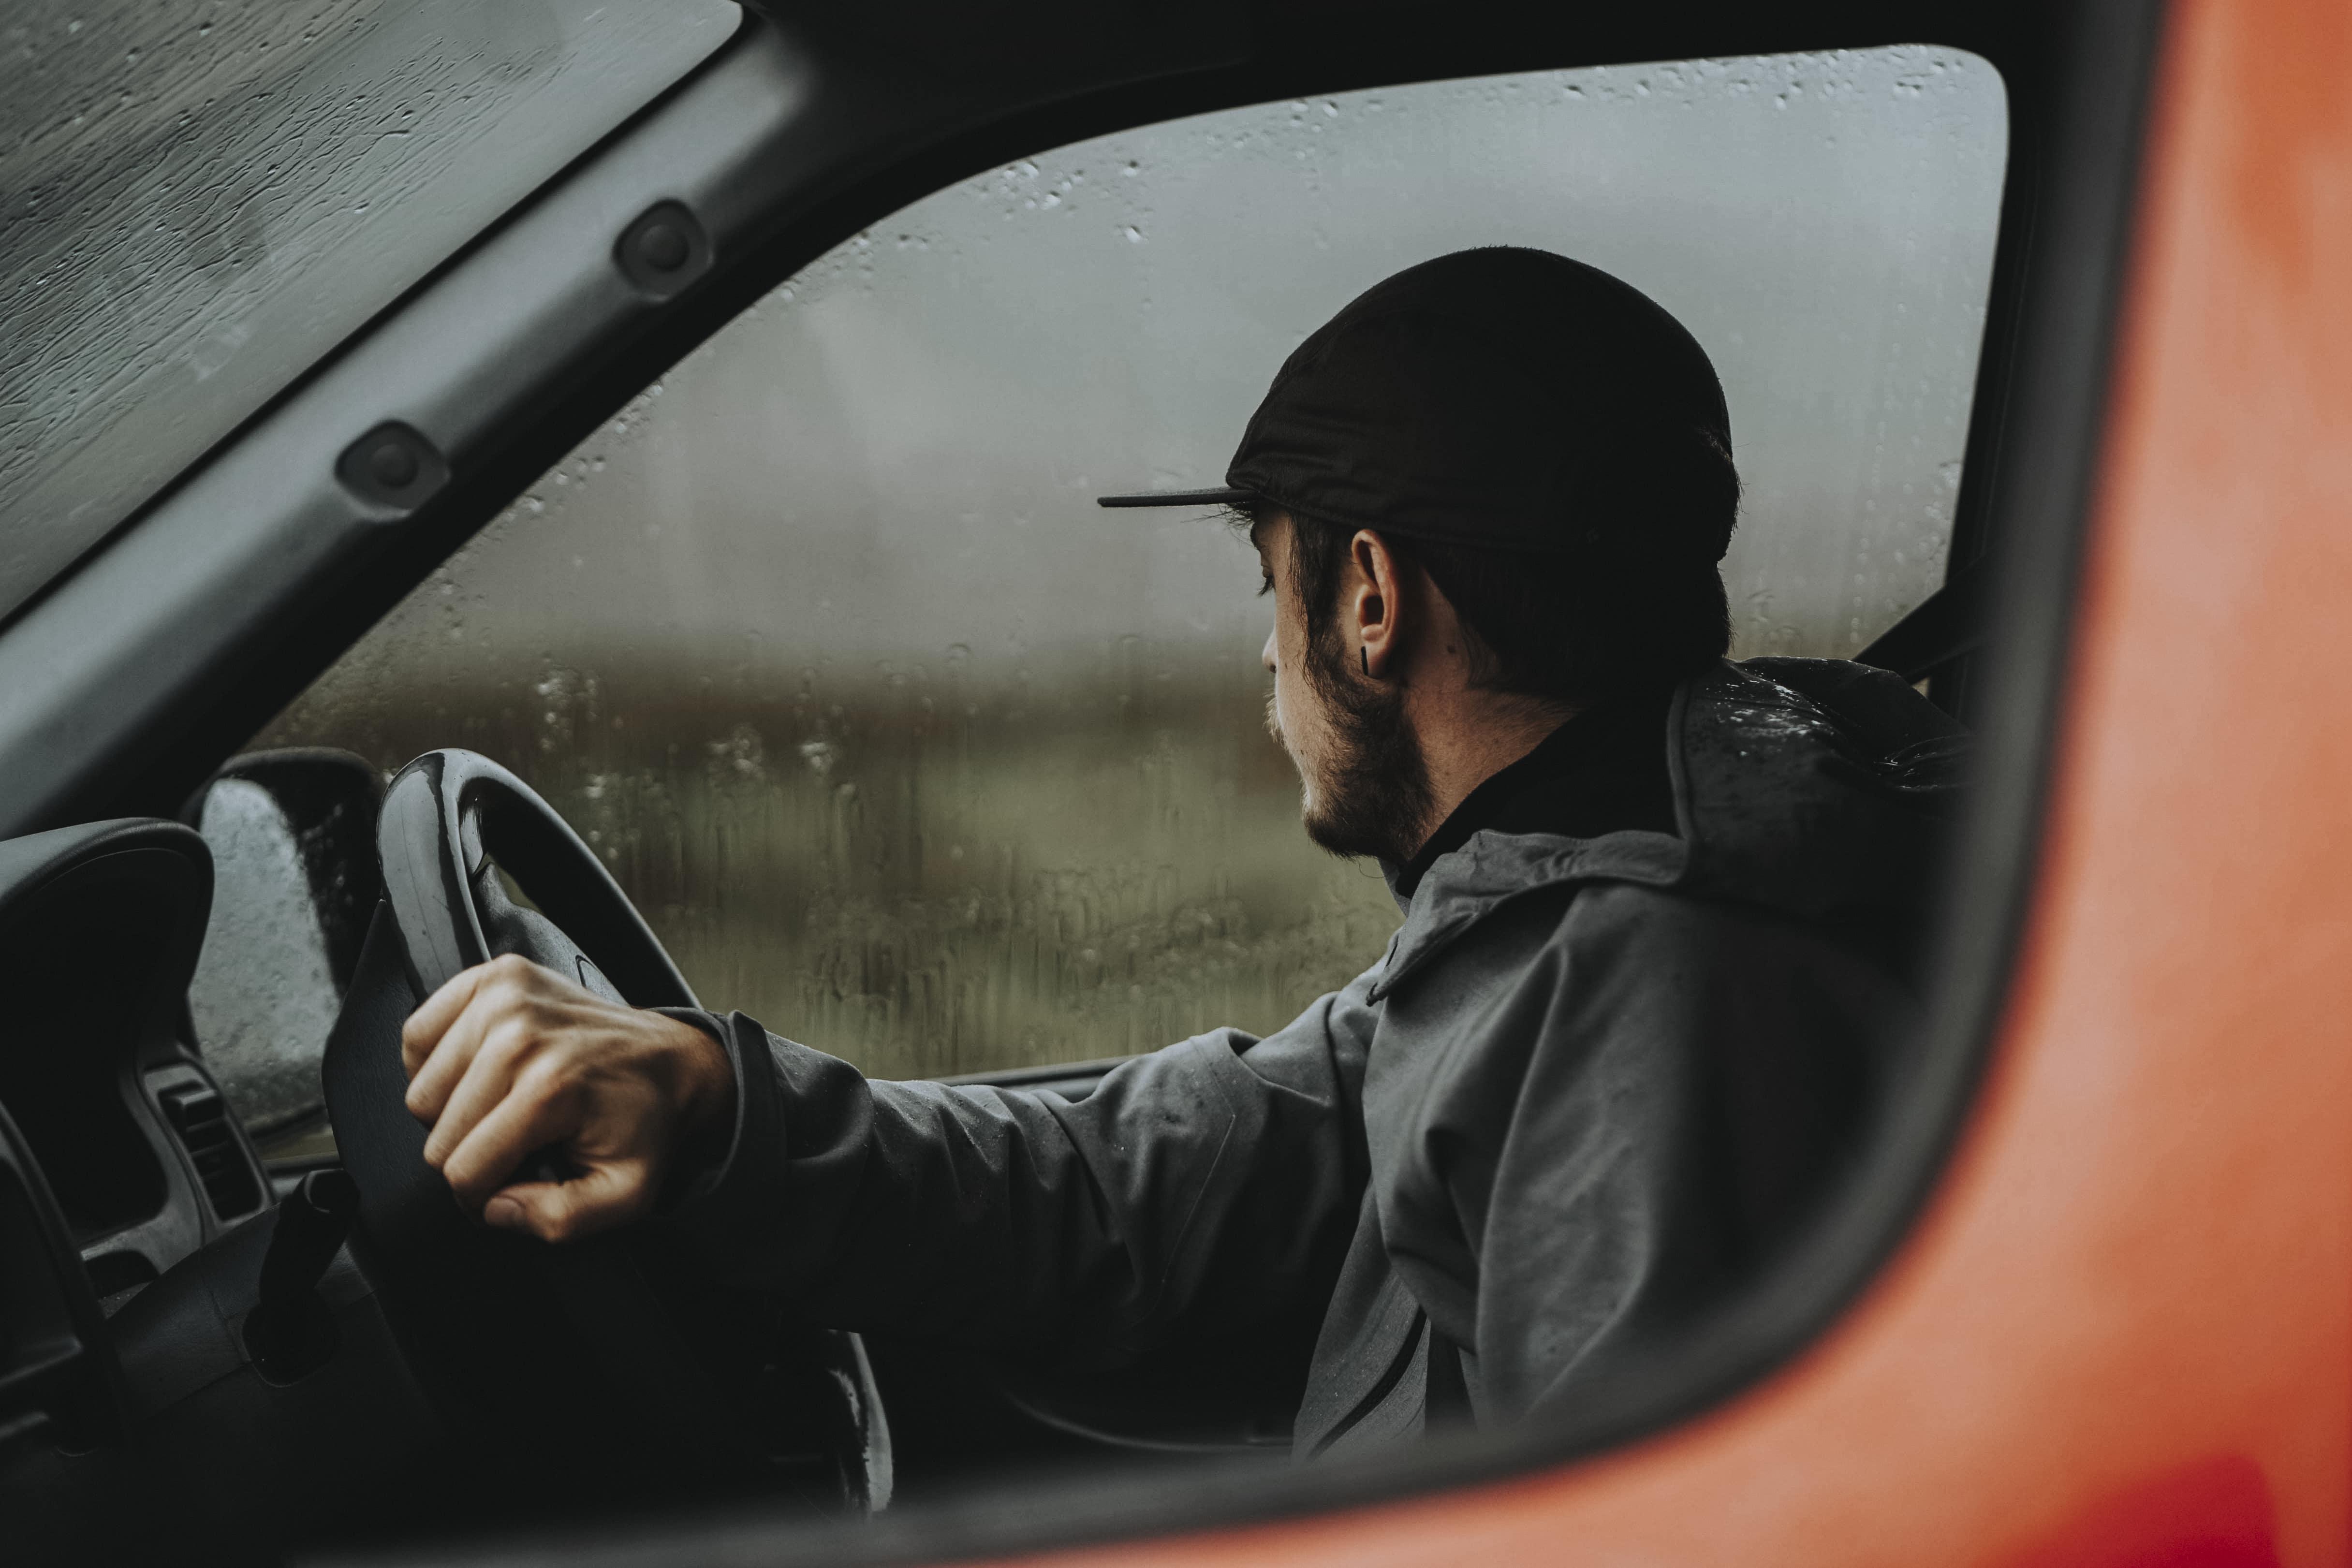 Driving while raining